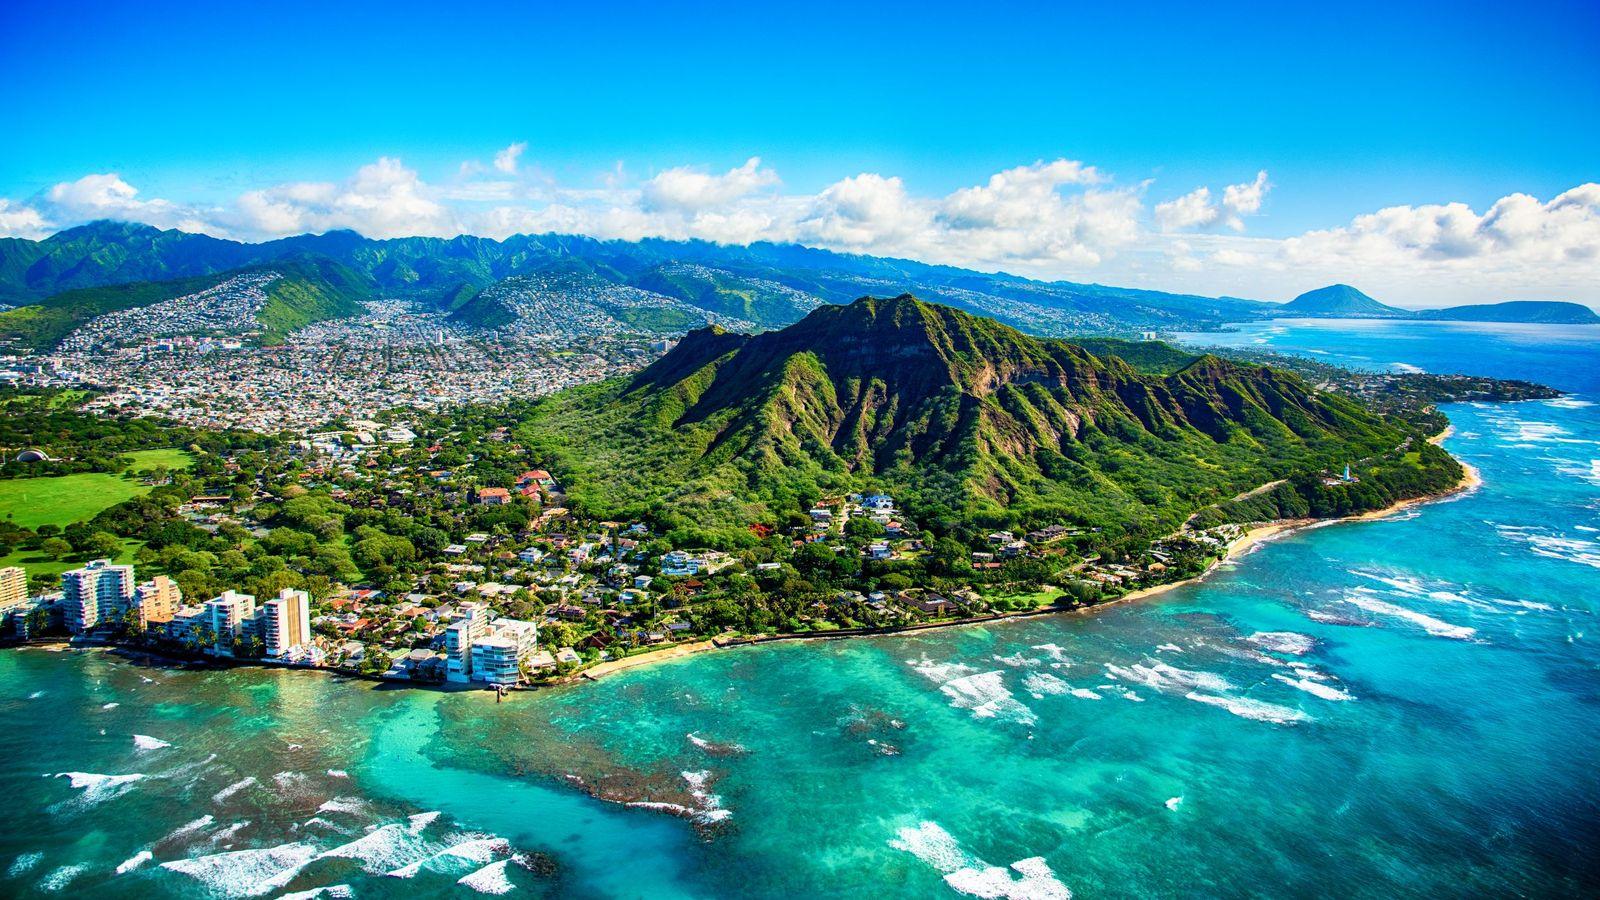 Hawaii tsunami watch dropped after 8.2 magnitude earthquake struck near Alaska